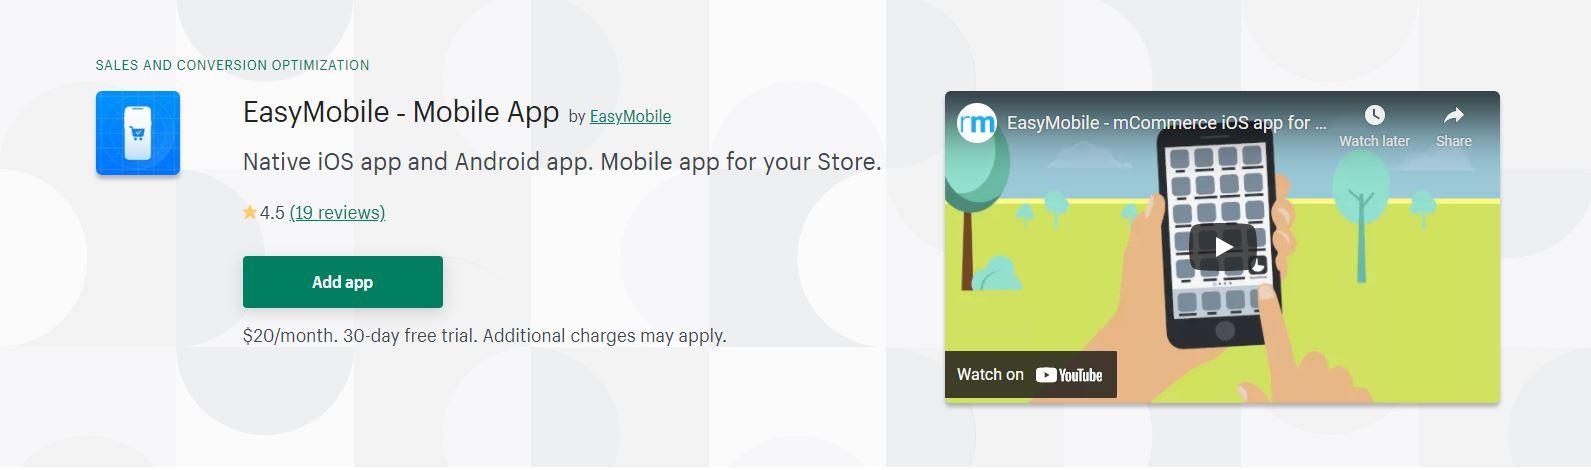 Shopify mobile app builder: